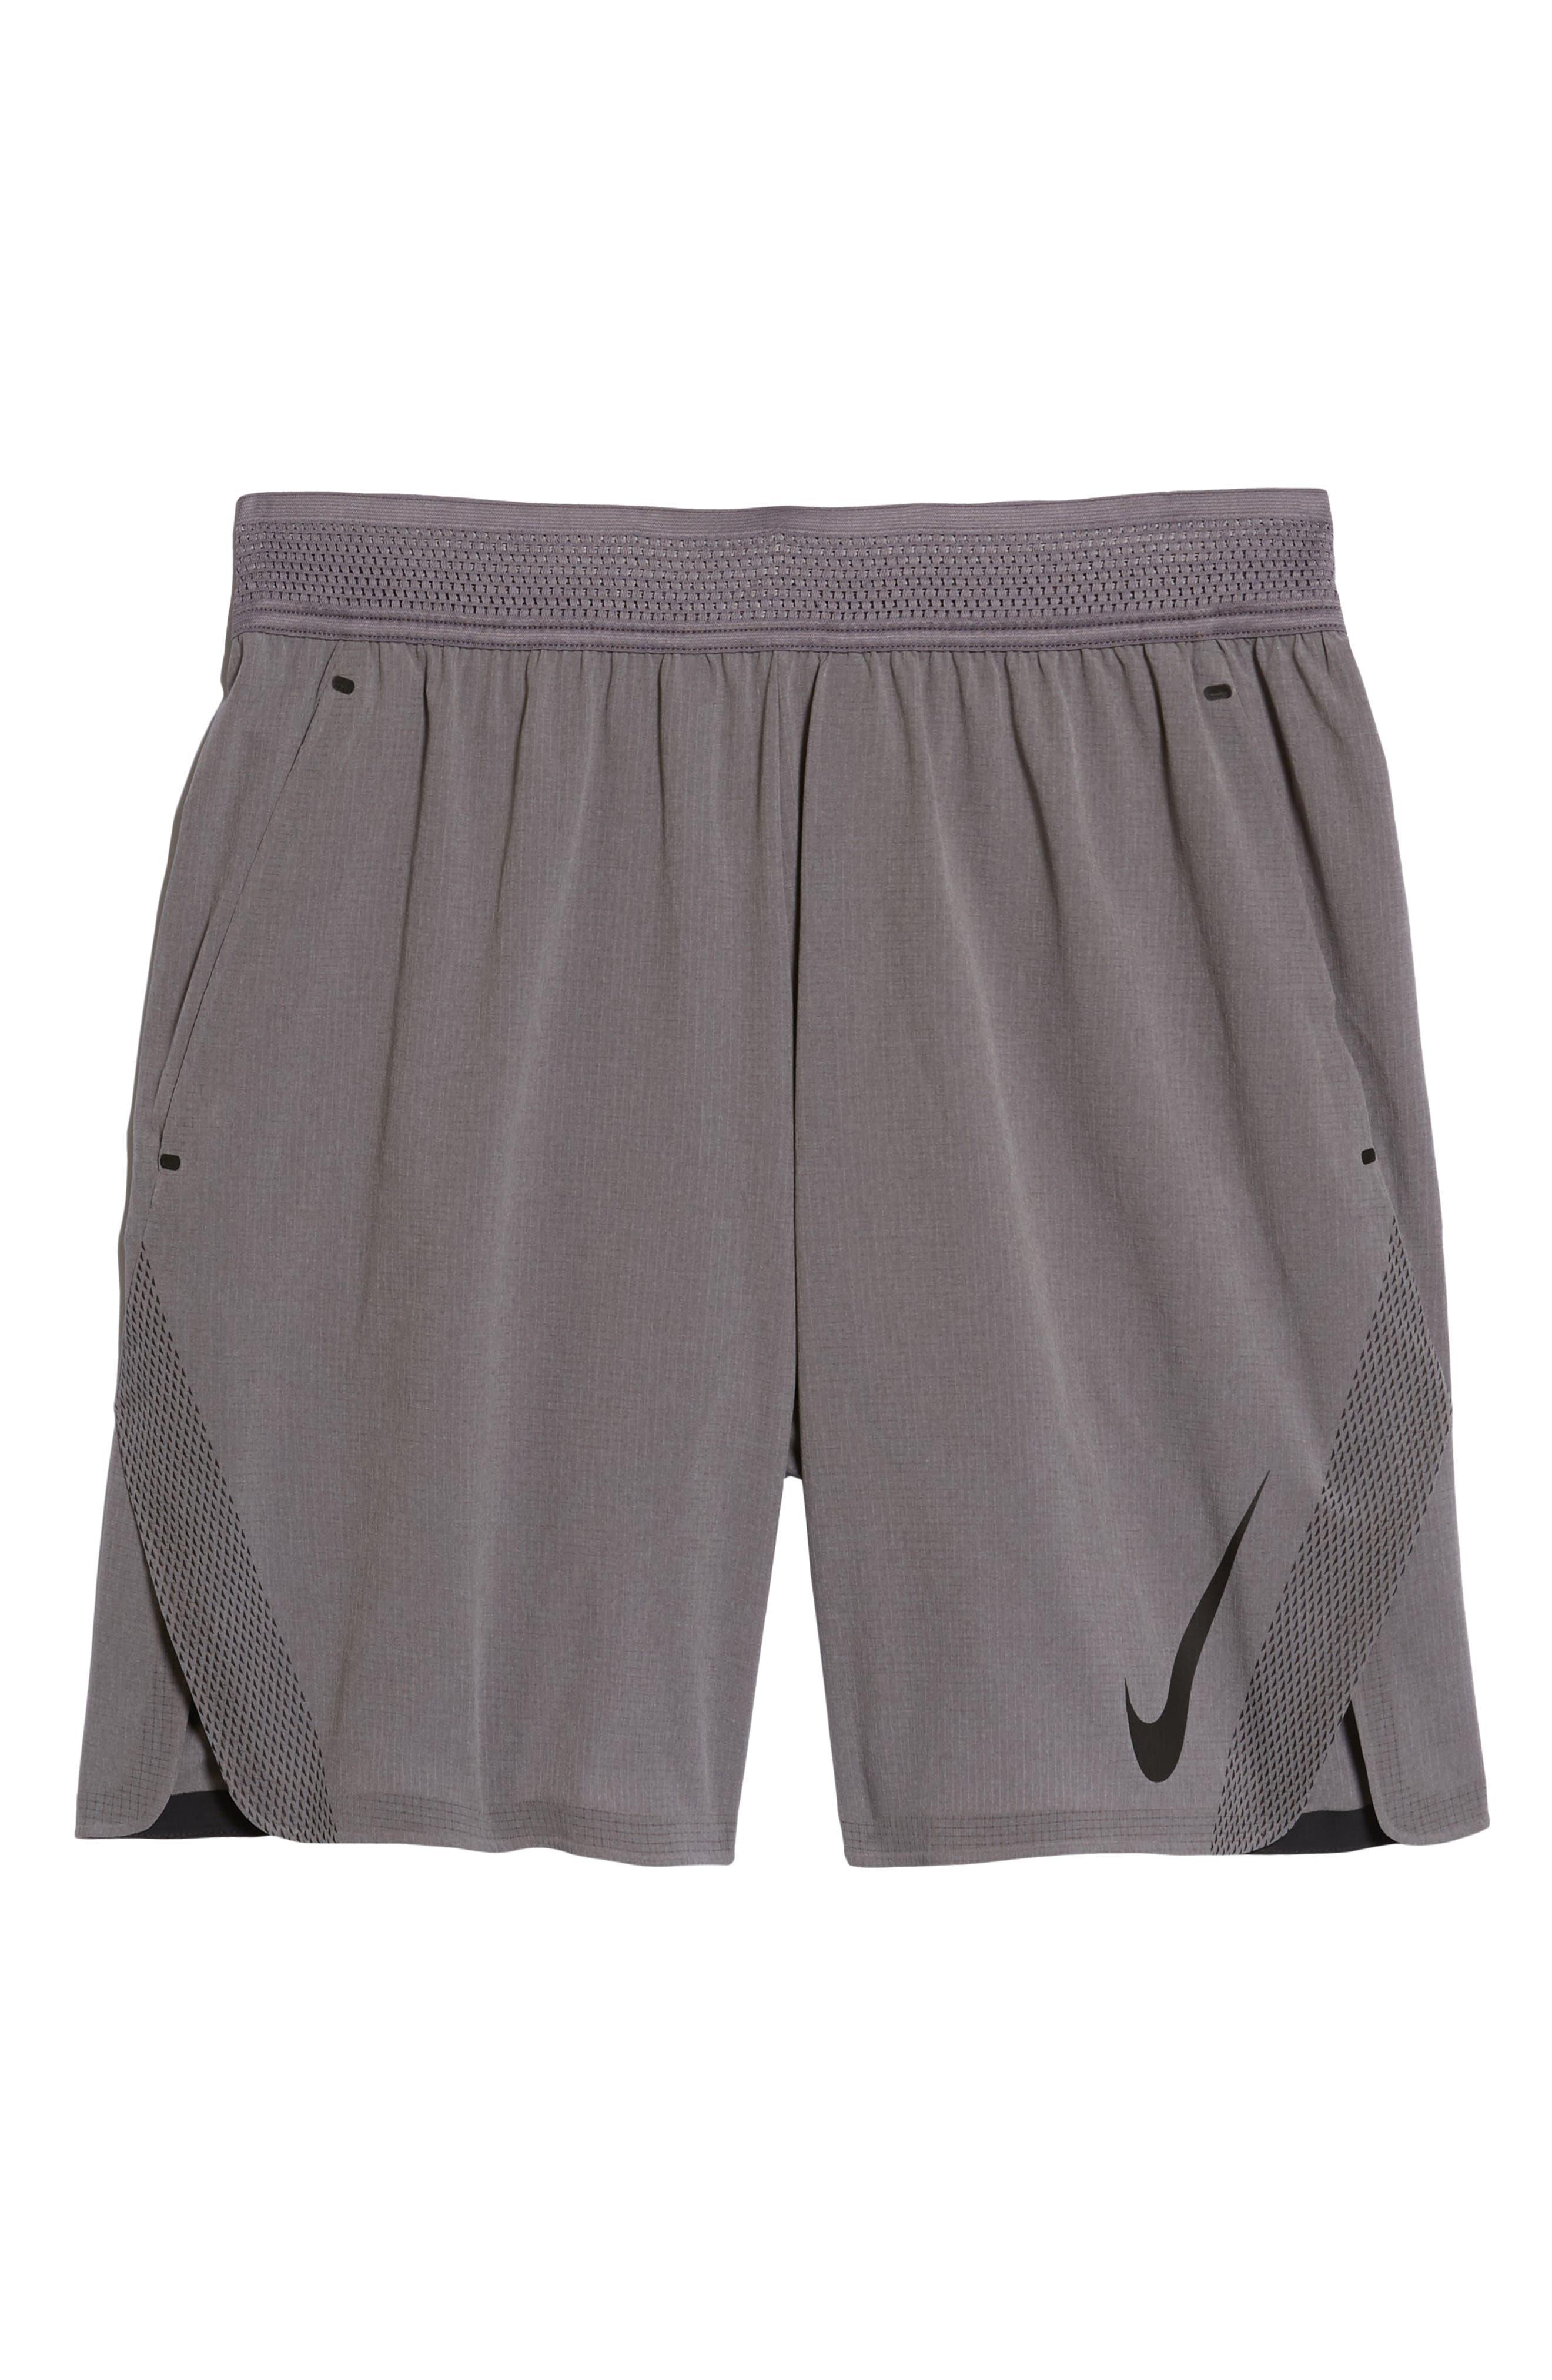 Repel 3.0 Flex Training Shorts,                             Alternate thumbnail 6, color,                             Gun Smoke/ Grey/ Black